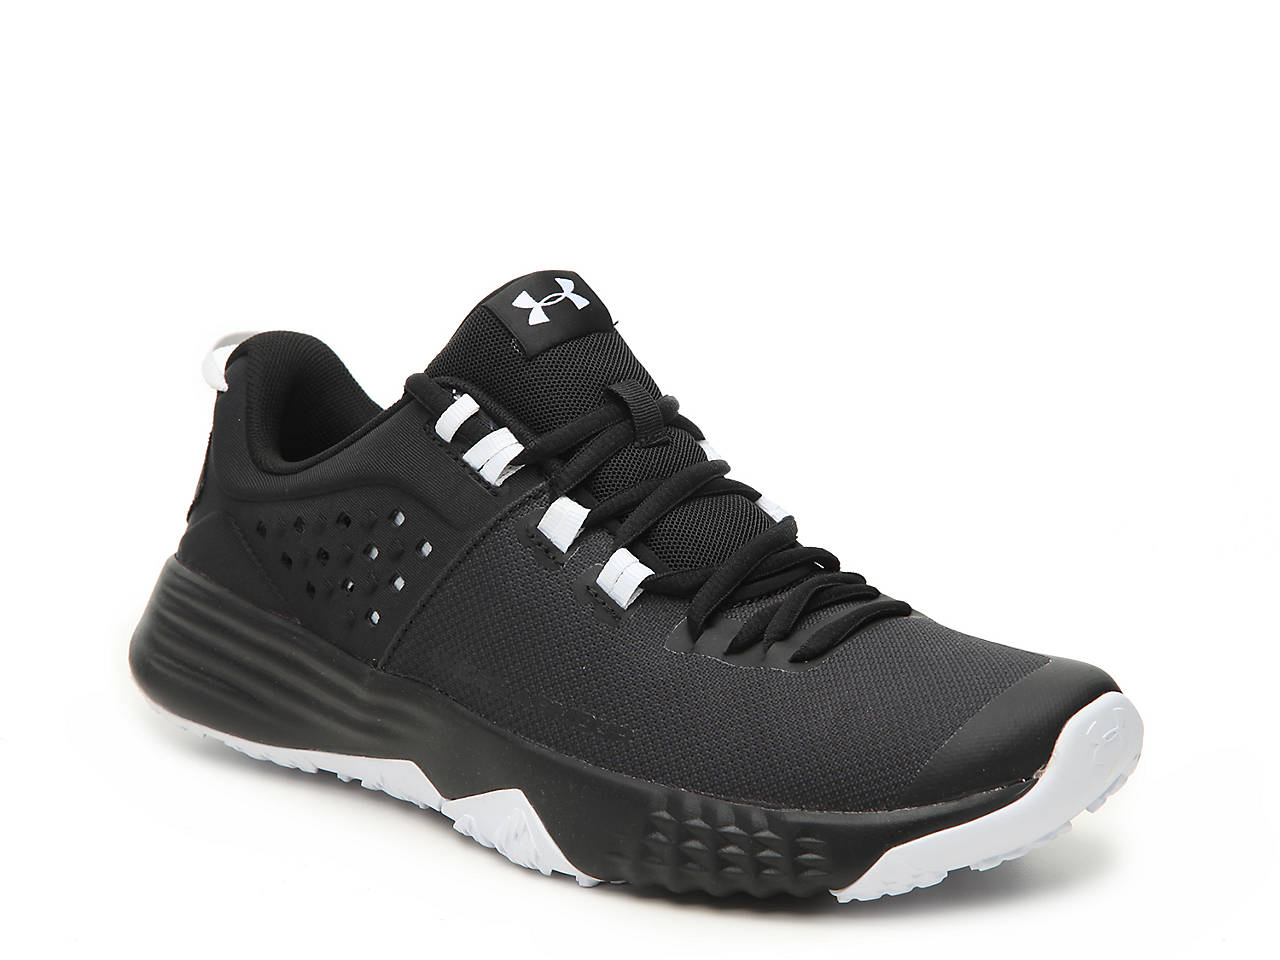 6efa6738 BAM Training Shoe - Men's